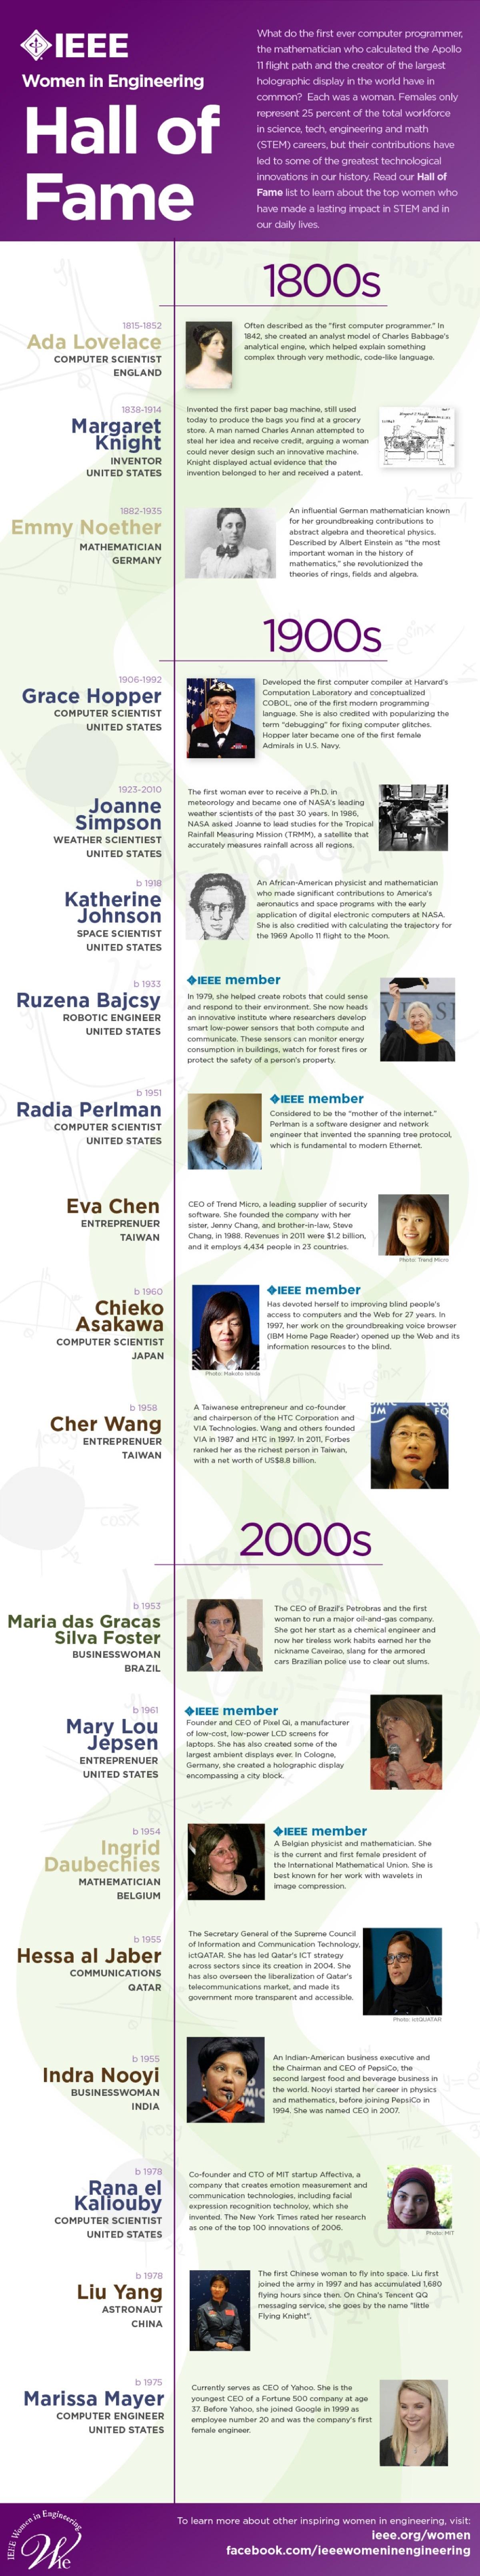 Women-In-Engineering